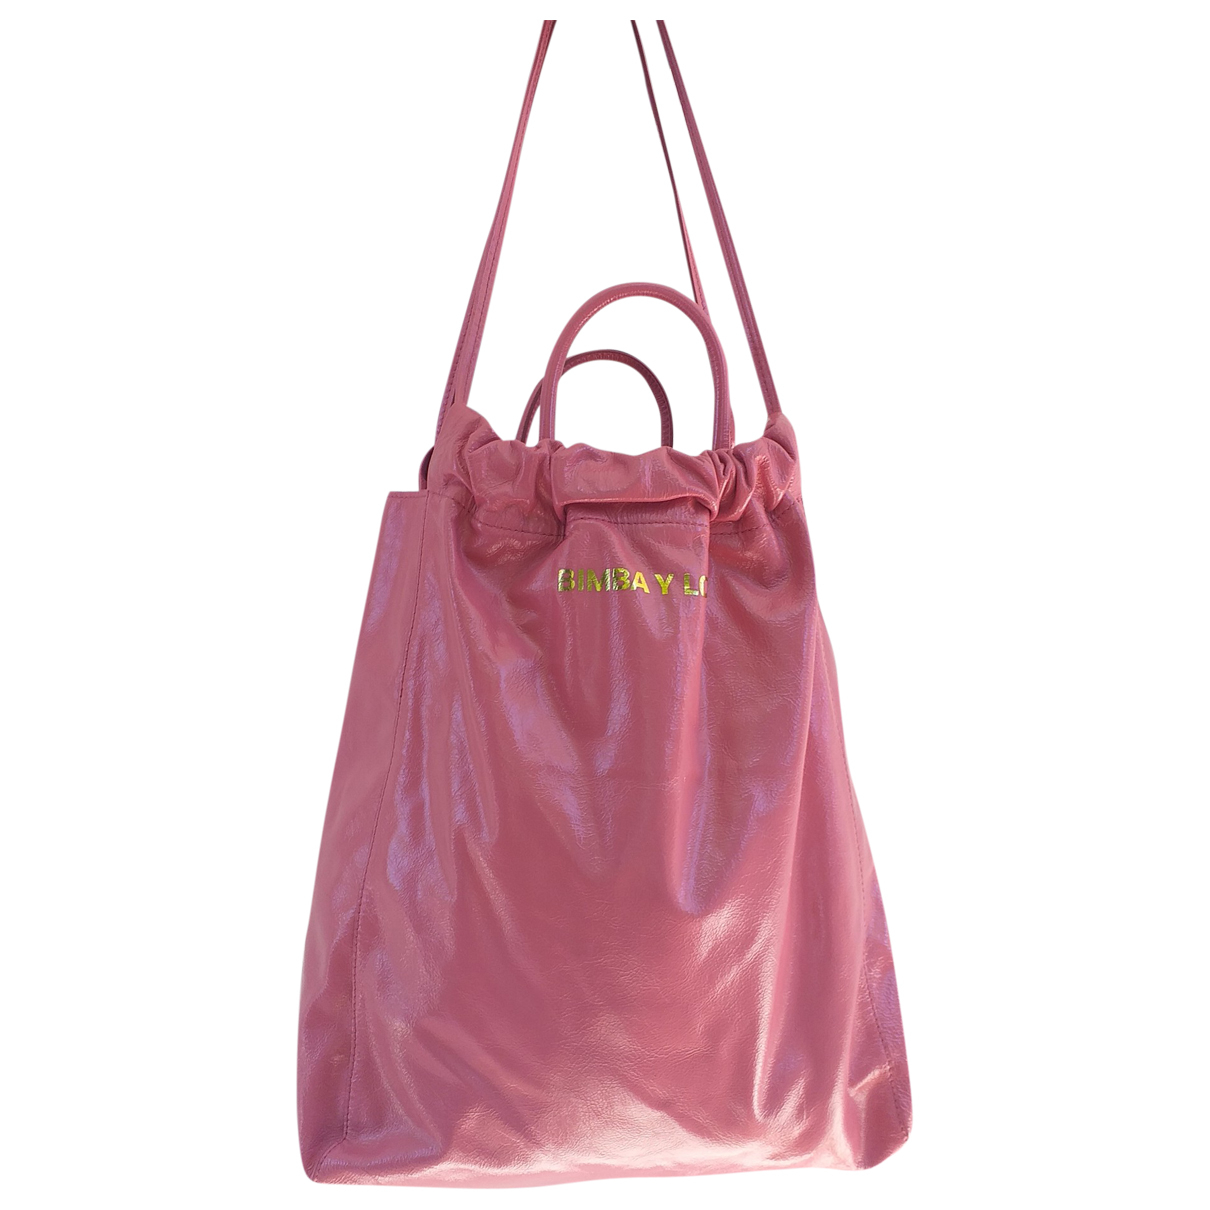 Bimba Y Lola \N Pink Leather handbag for Women \N